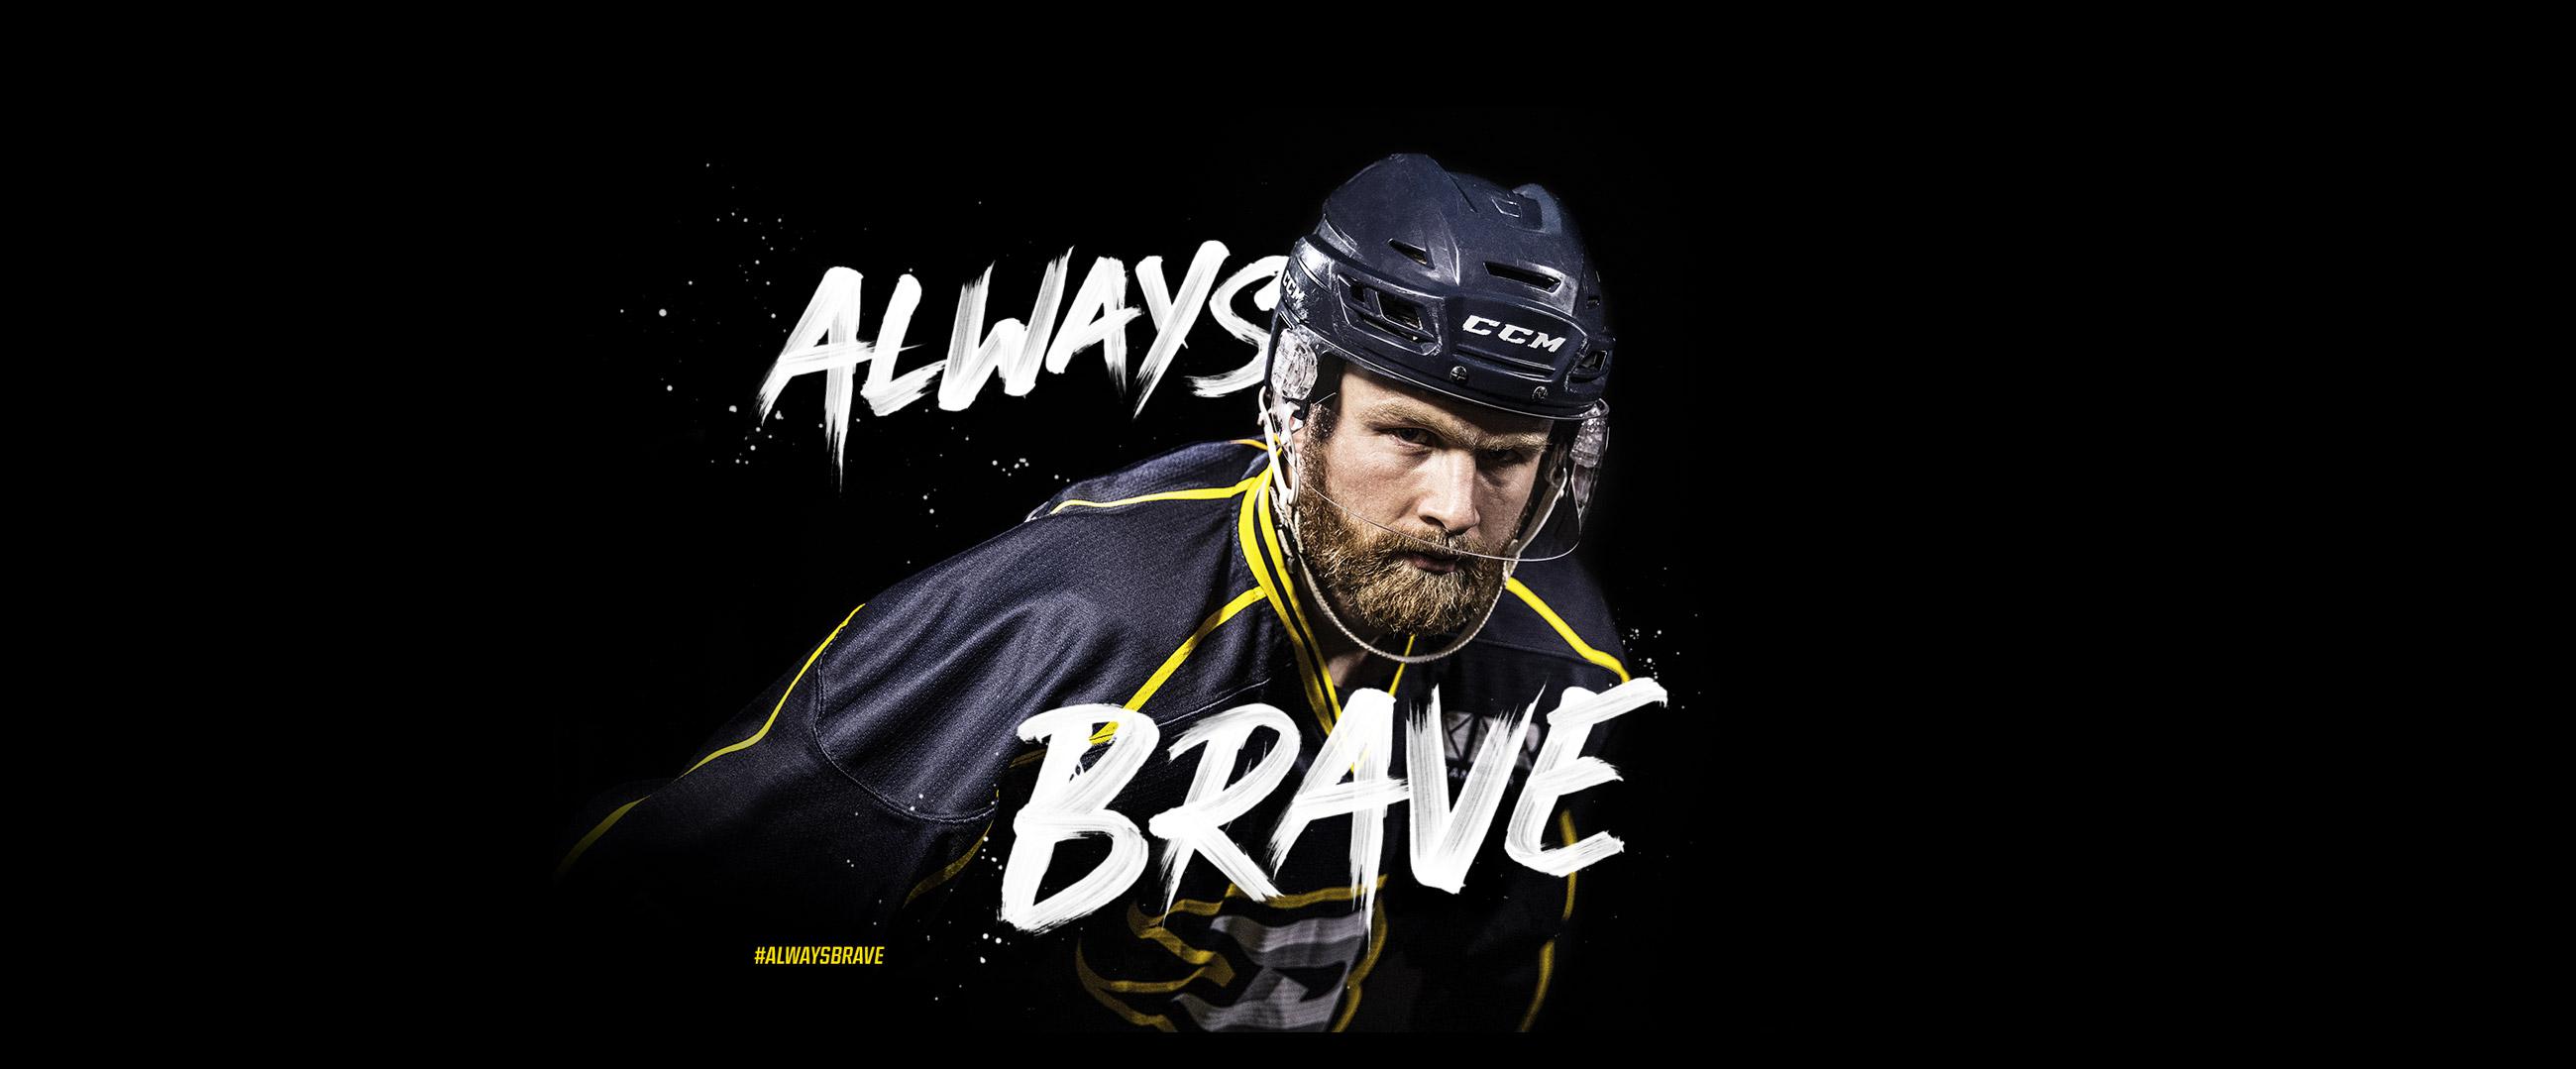 CBR Brave Background Image